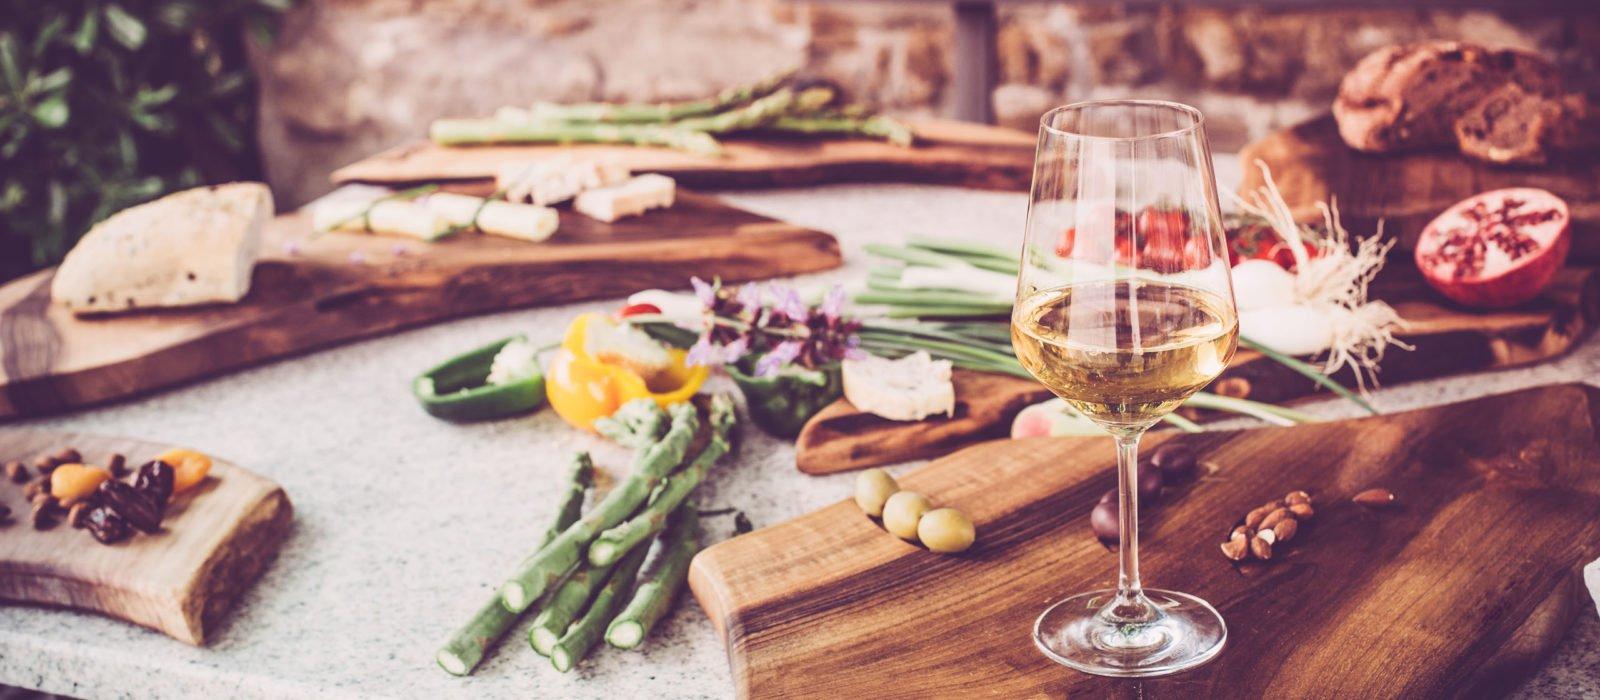 Food and wine, Slovenia